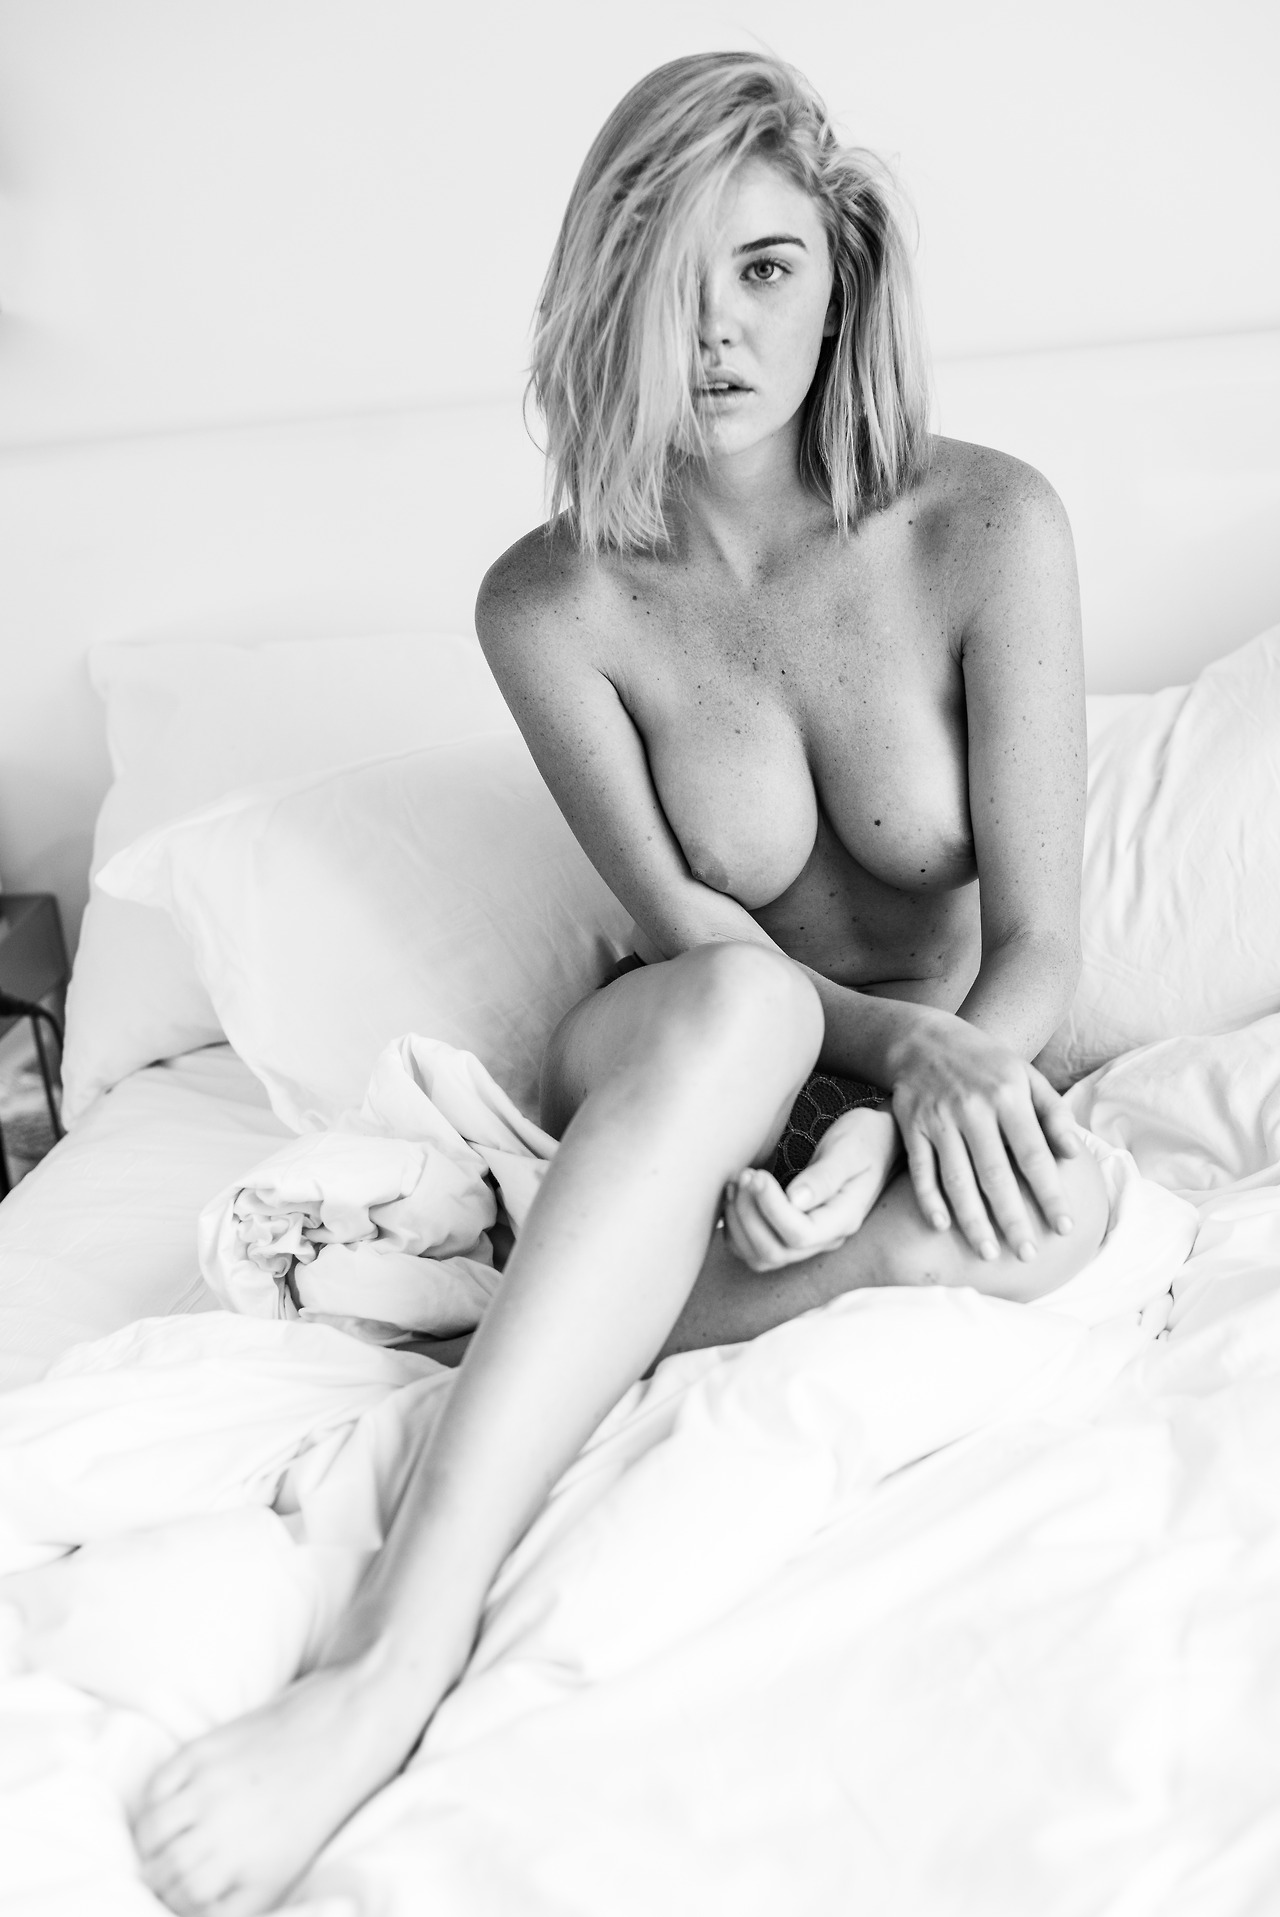 Lisa nicole carlson nude